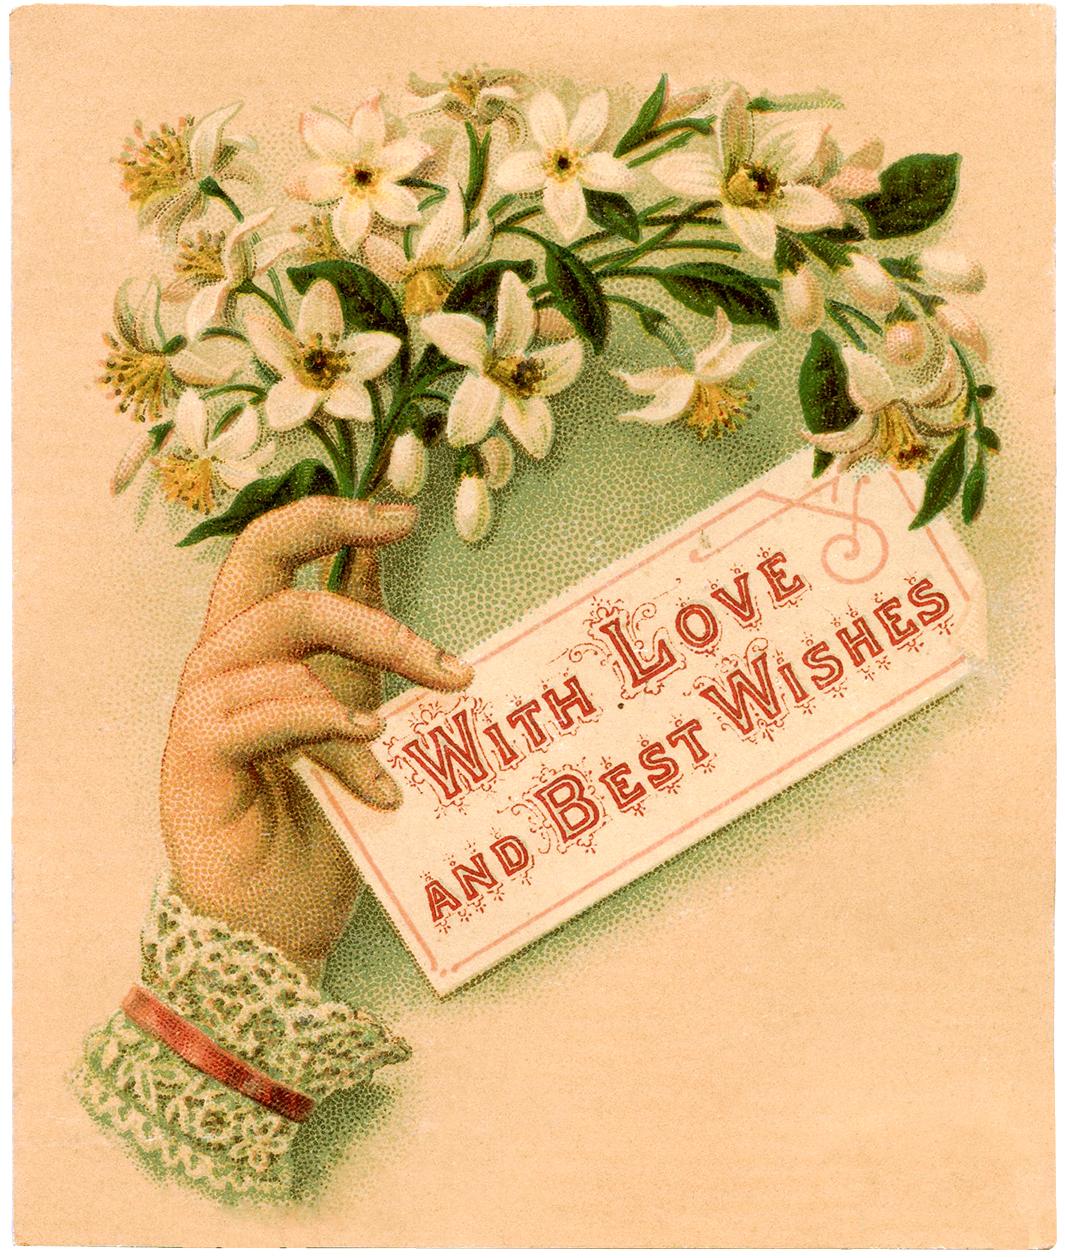 Vintage Ladies Hand Image